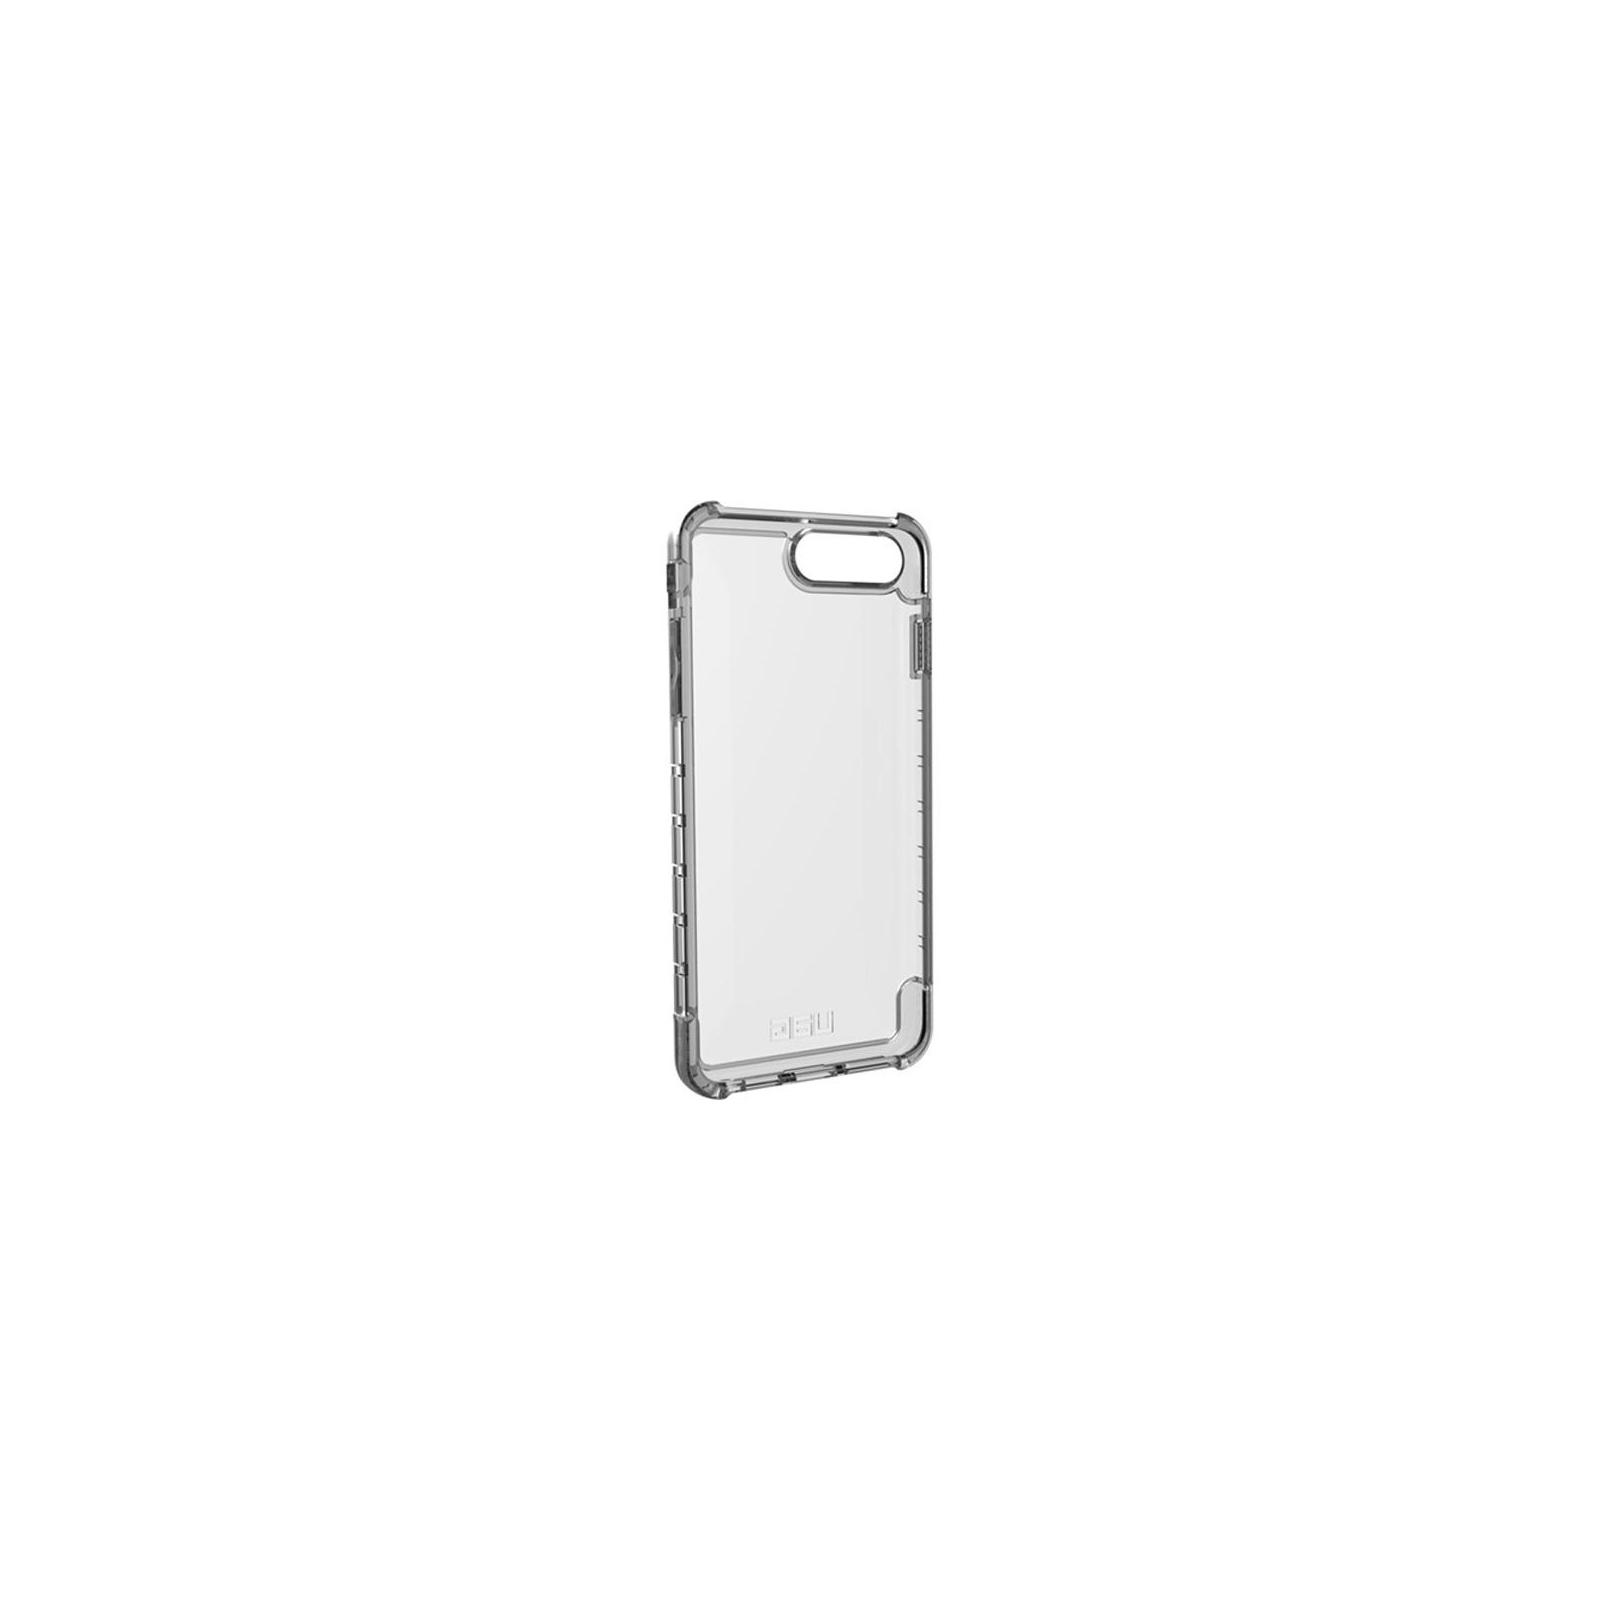 Чехол для моб. телефона UAG iPhone 8/7/6S/6 Plus Plyo Ice (IPH8/7PLS-Y-IC) изображение 4